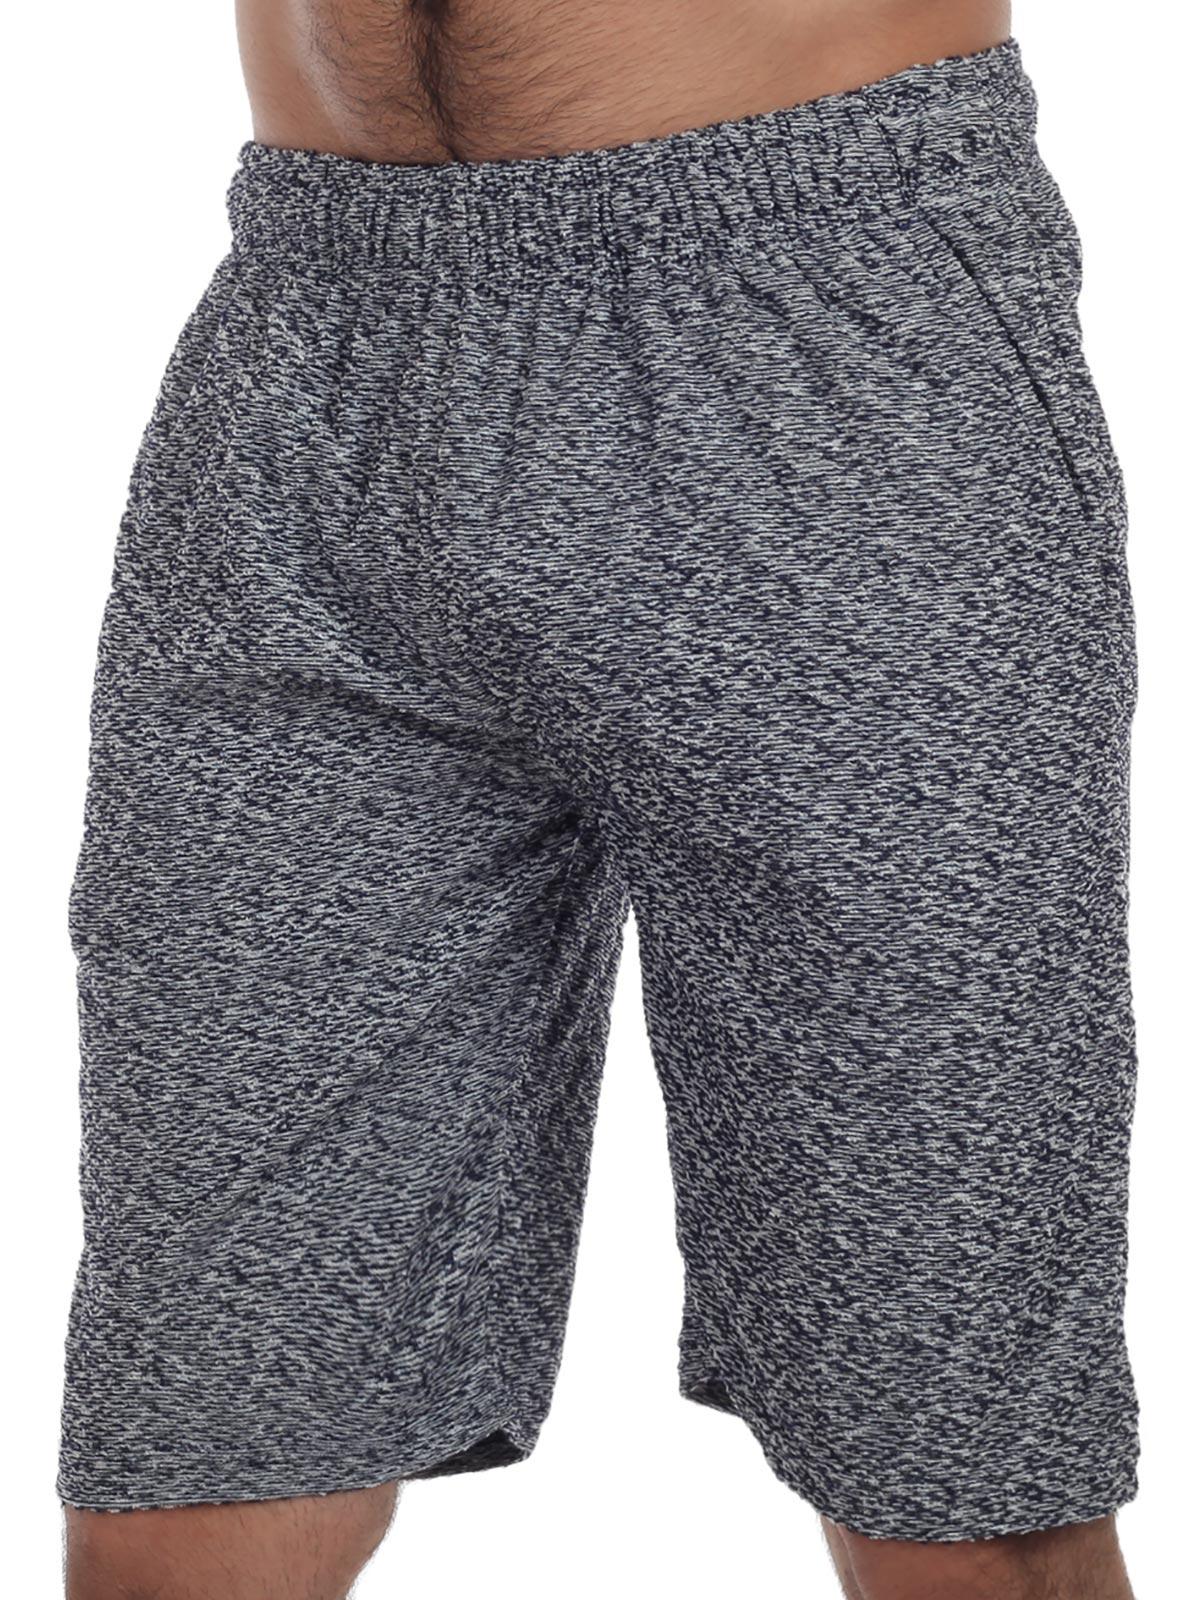 Пижамно-домашние мужские шорты Growth by Grail